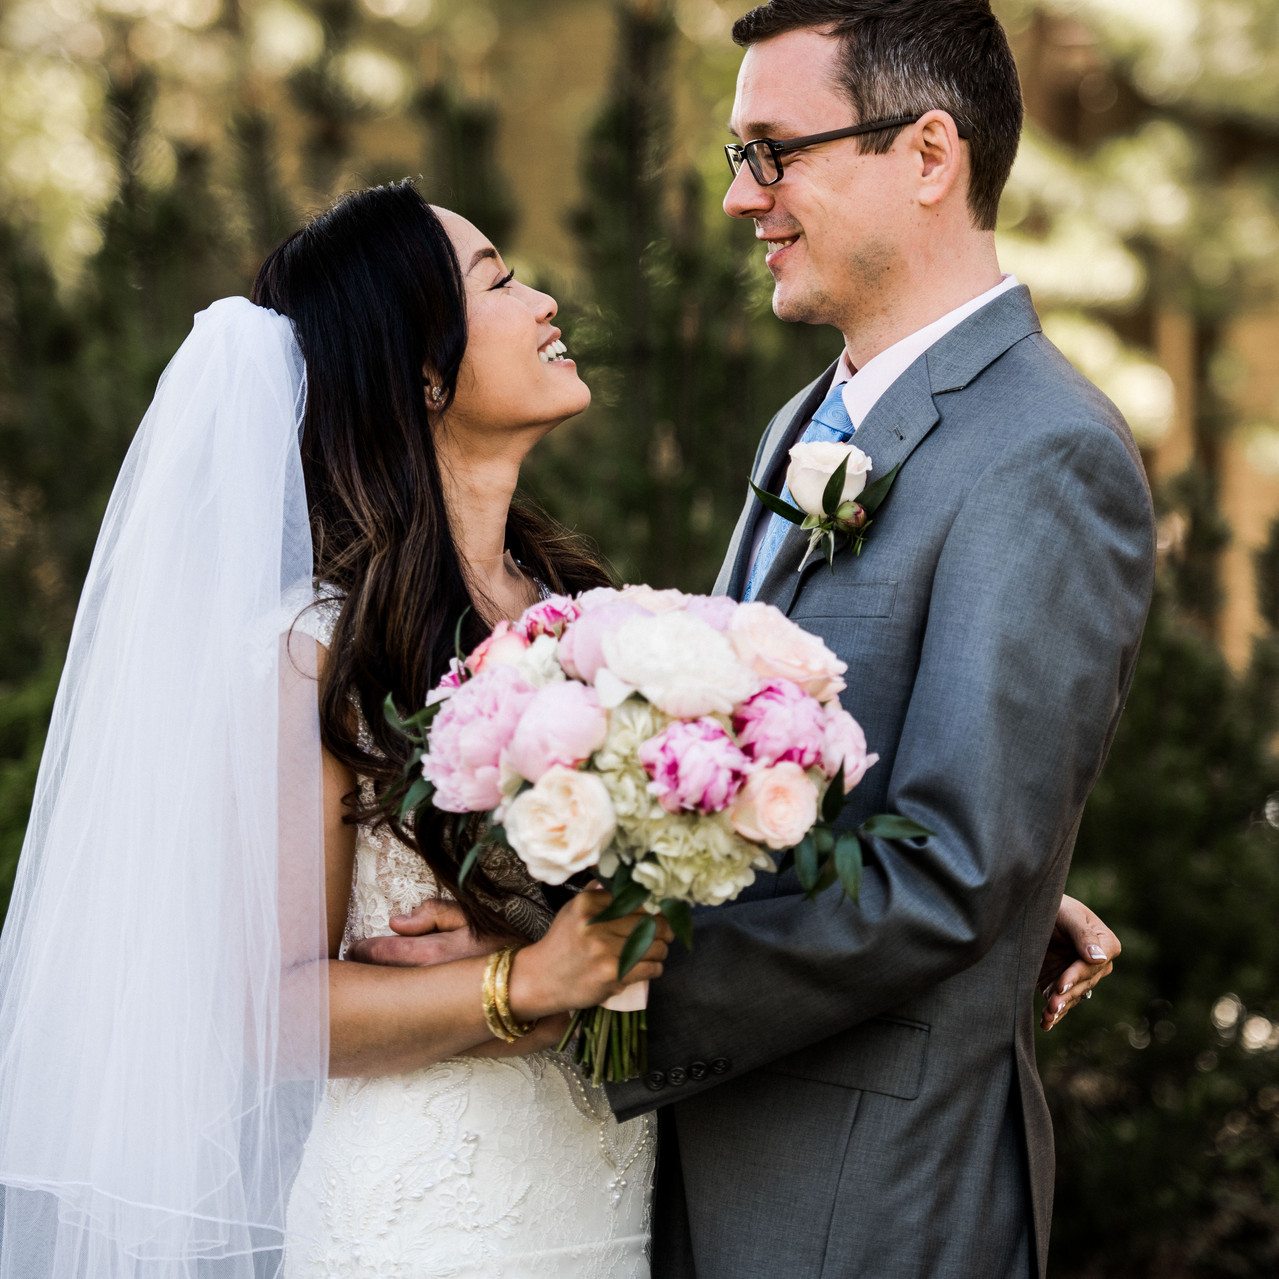 A-Floral-Affair-HYATT-LAKE-TAHOE-WEDDING-FLORIST (2)